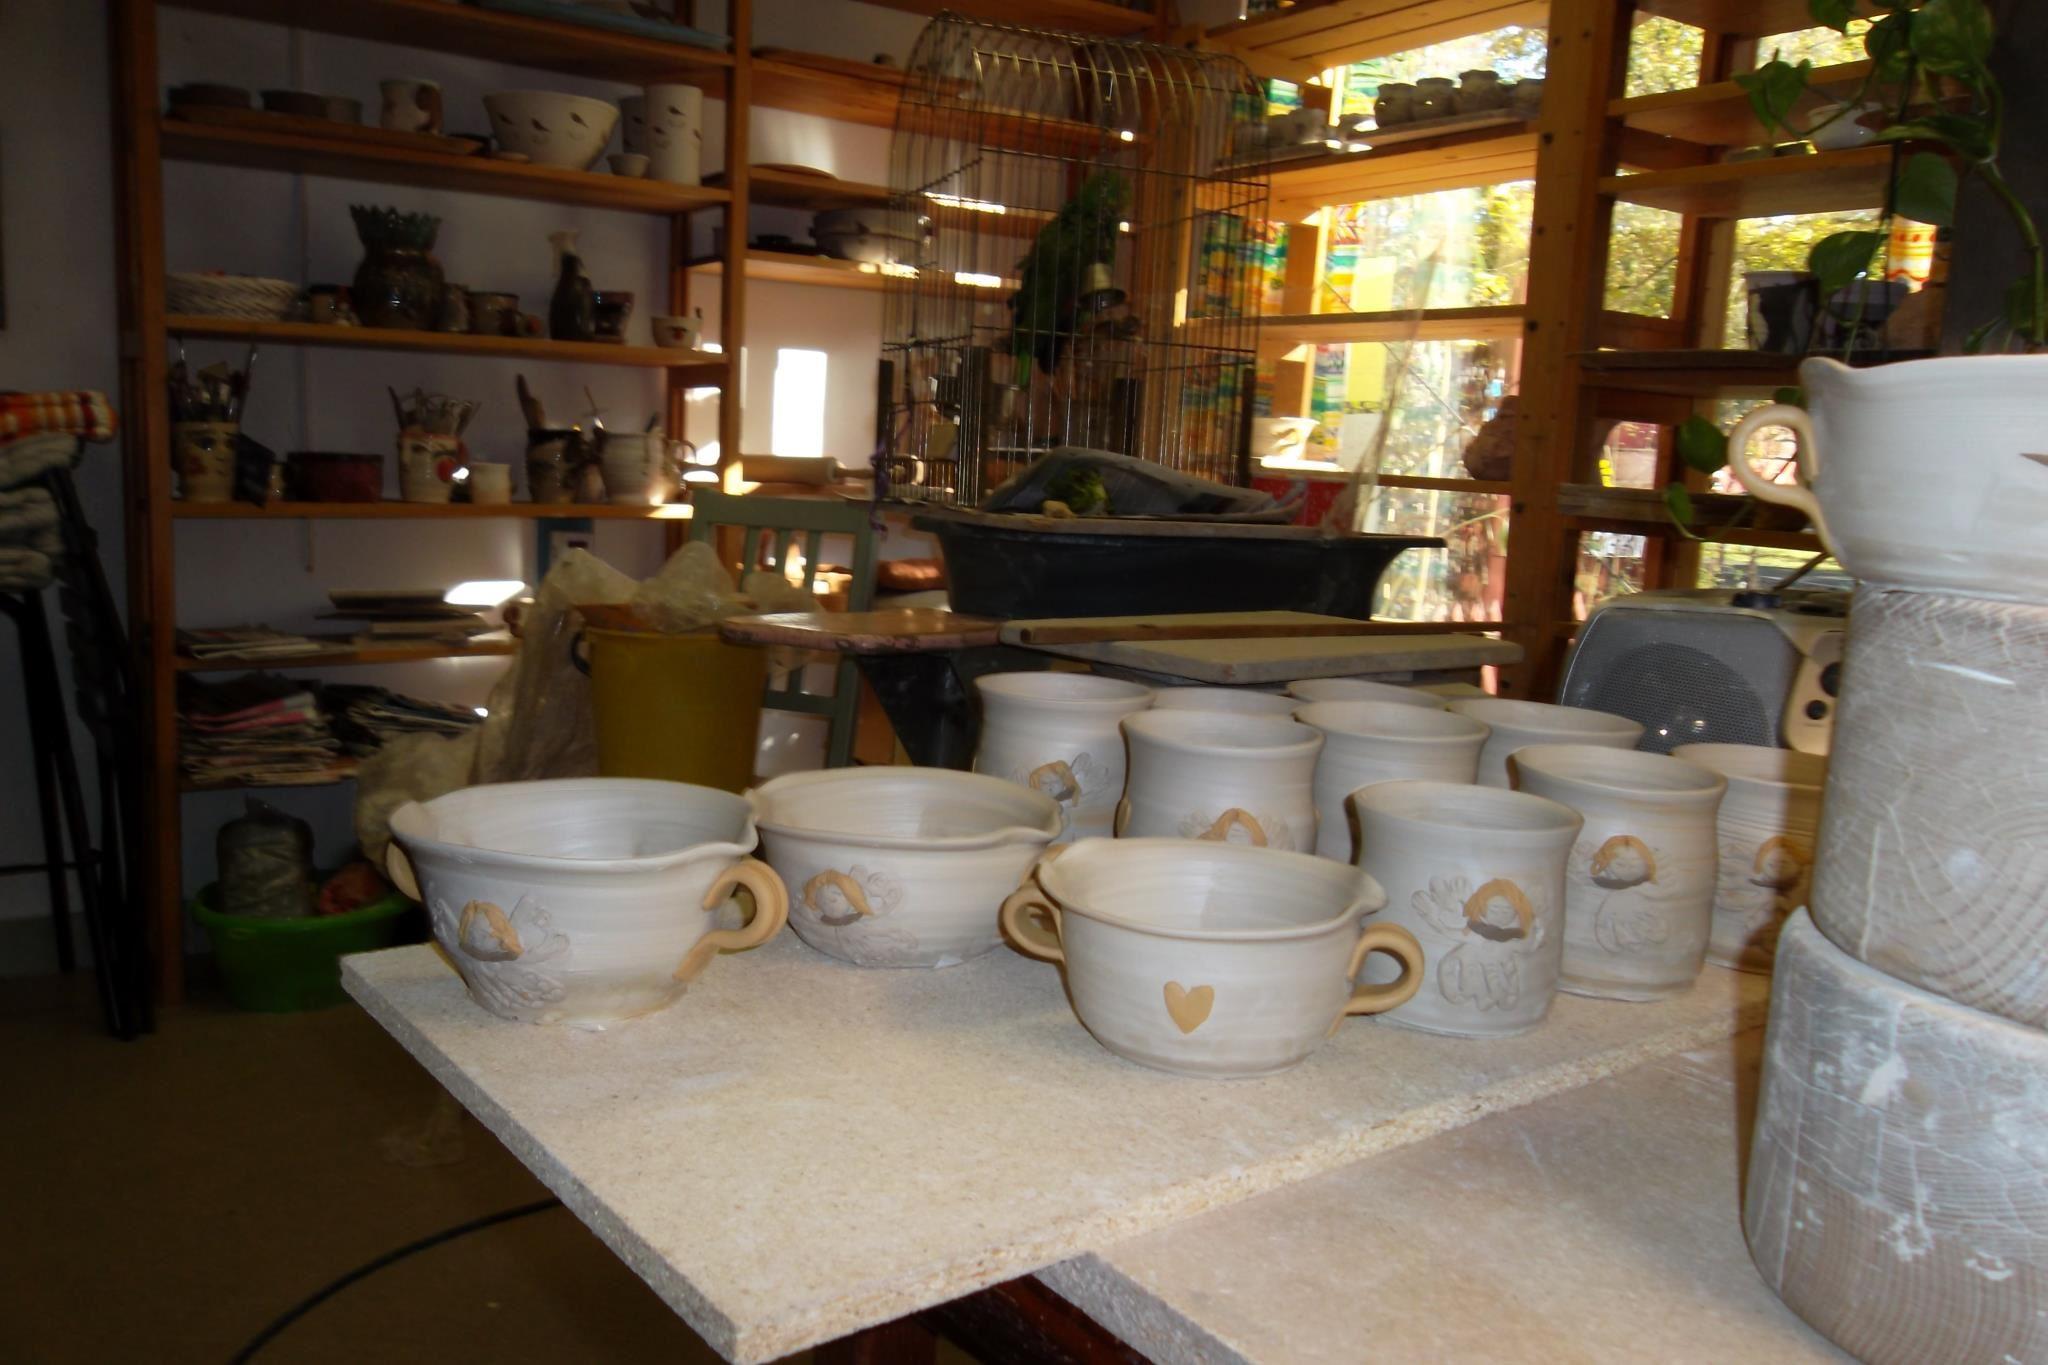 Fotograf: Ingalill Carlbark,  © Trollets Keramik, Trollets keramik och måleri